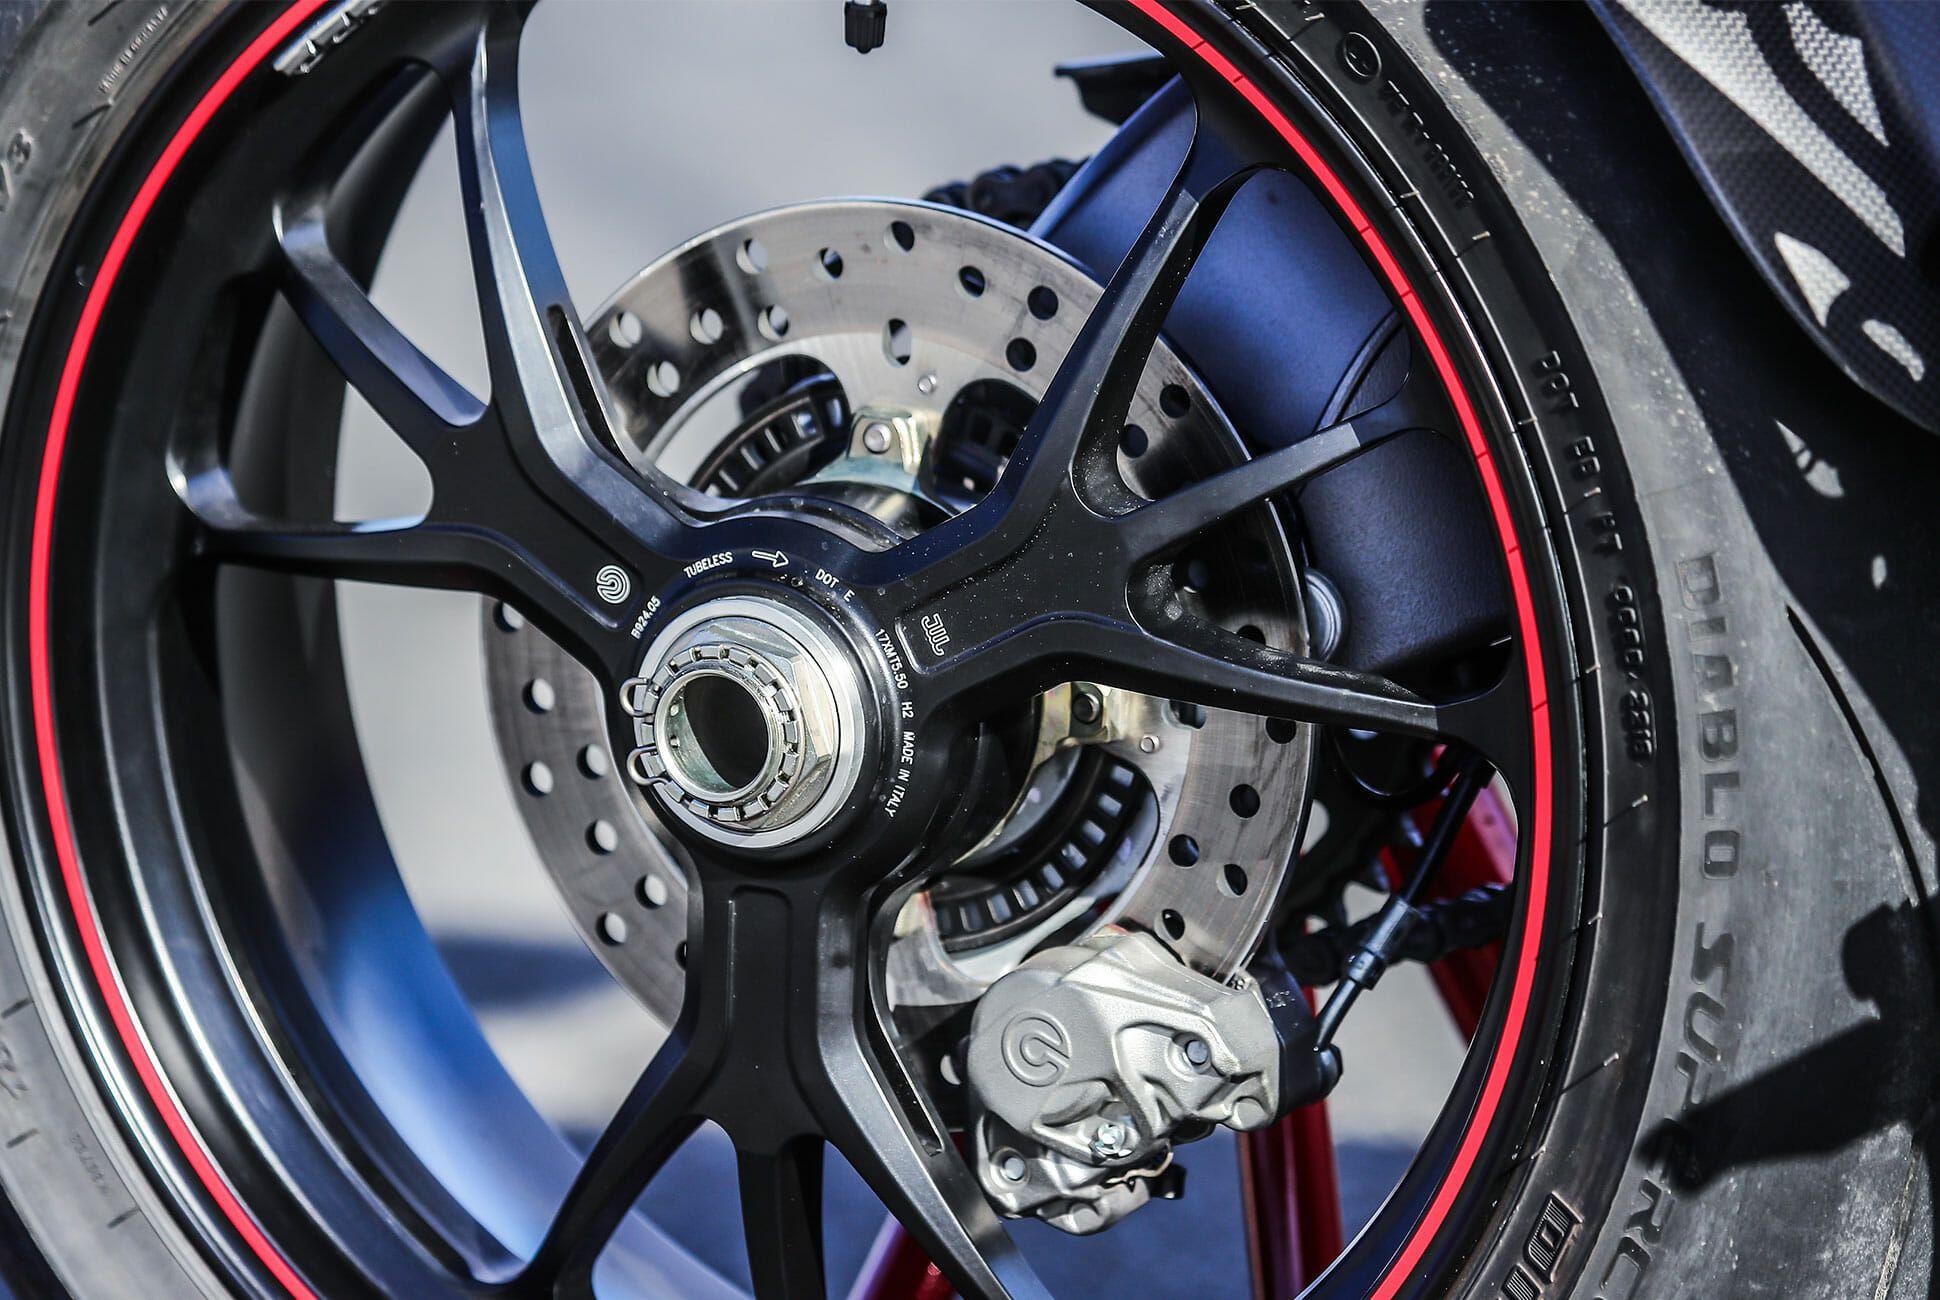 Ducati-Hypermotard-950-SP-Review-gear-patrol-slide-6